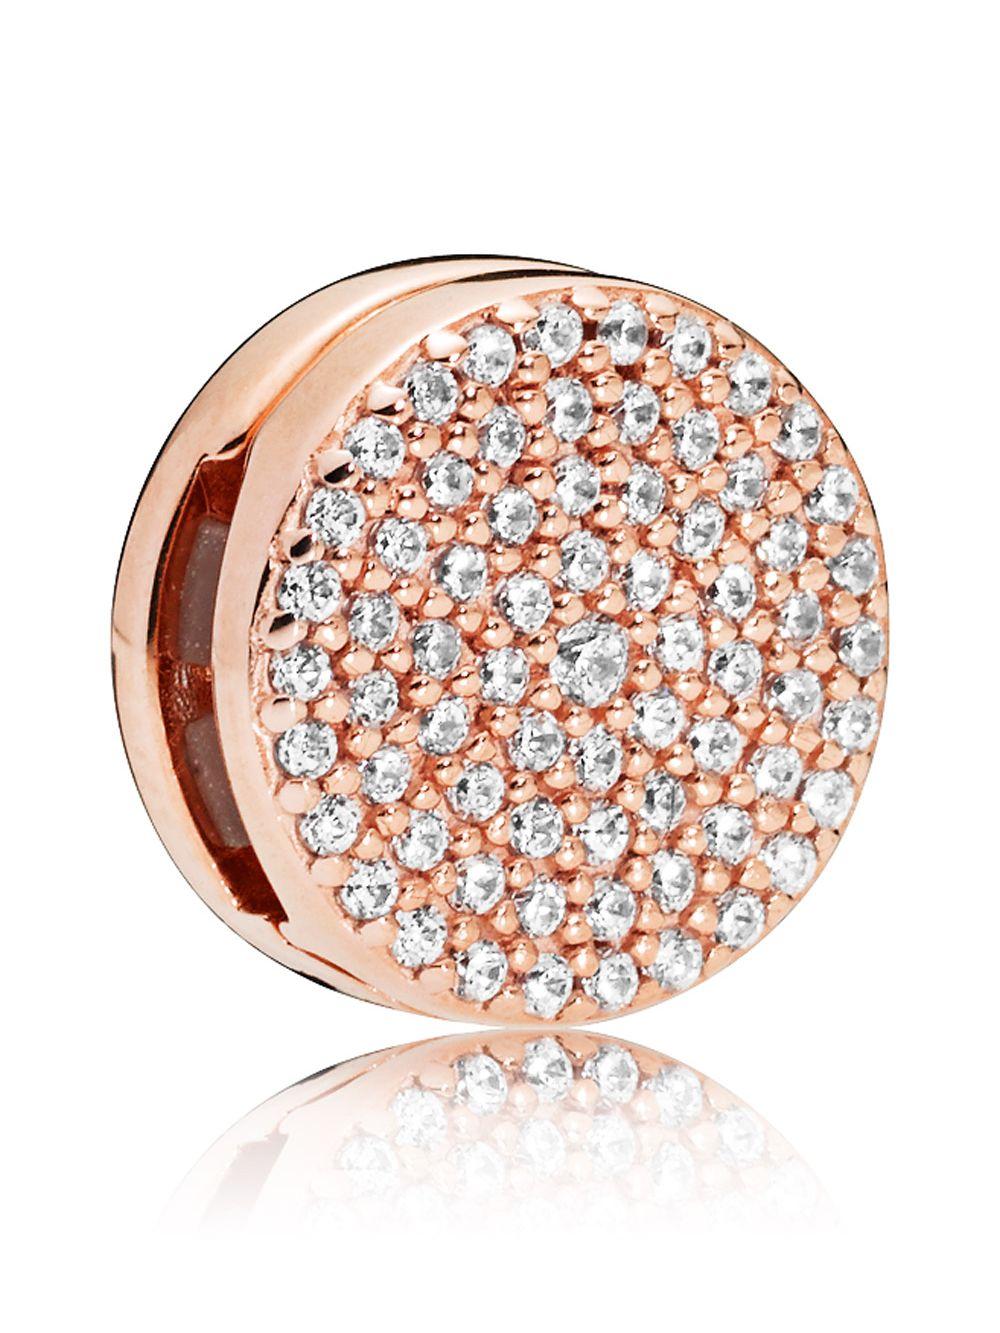 ccf0acd6a8072 Pandora 787583CZ Reflexions Dazzling Elegance Clip Charm Rose